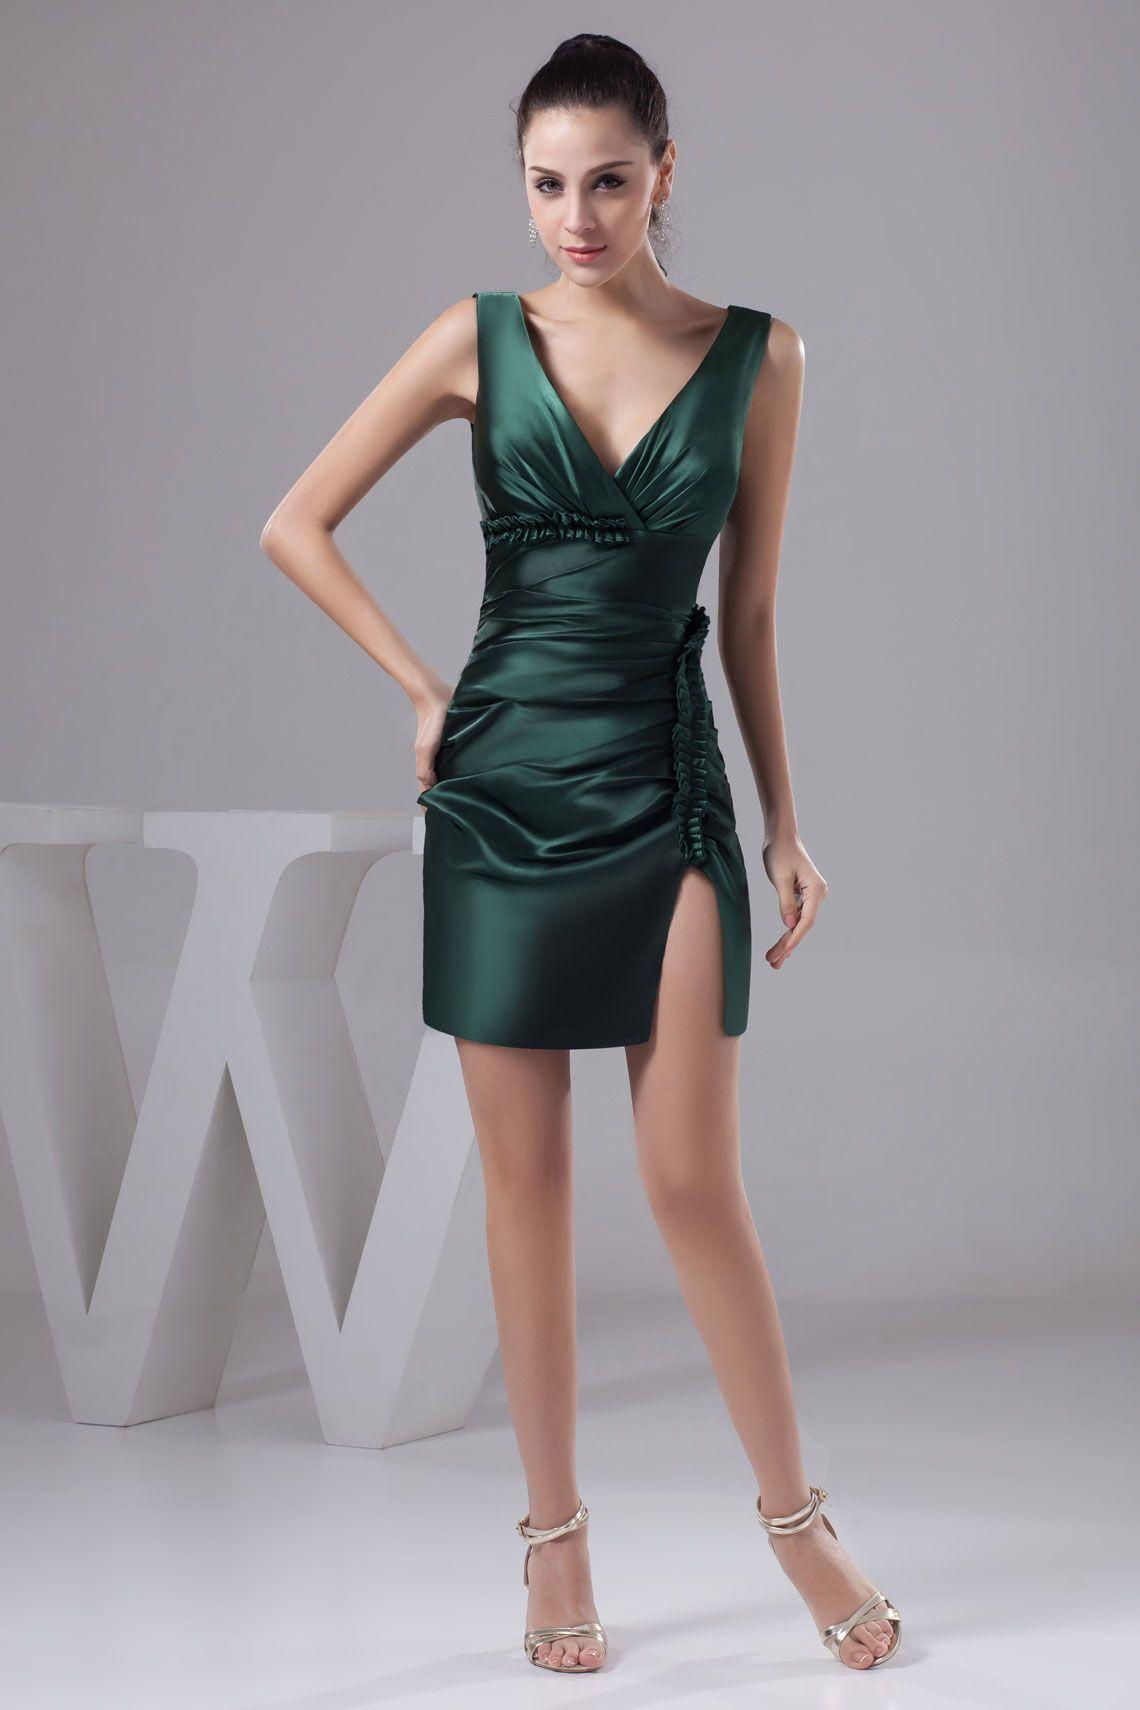 Green dress v neck  Hunter Short VNeck Satin Sheath Cocktail Dress With Pleated